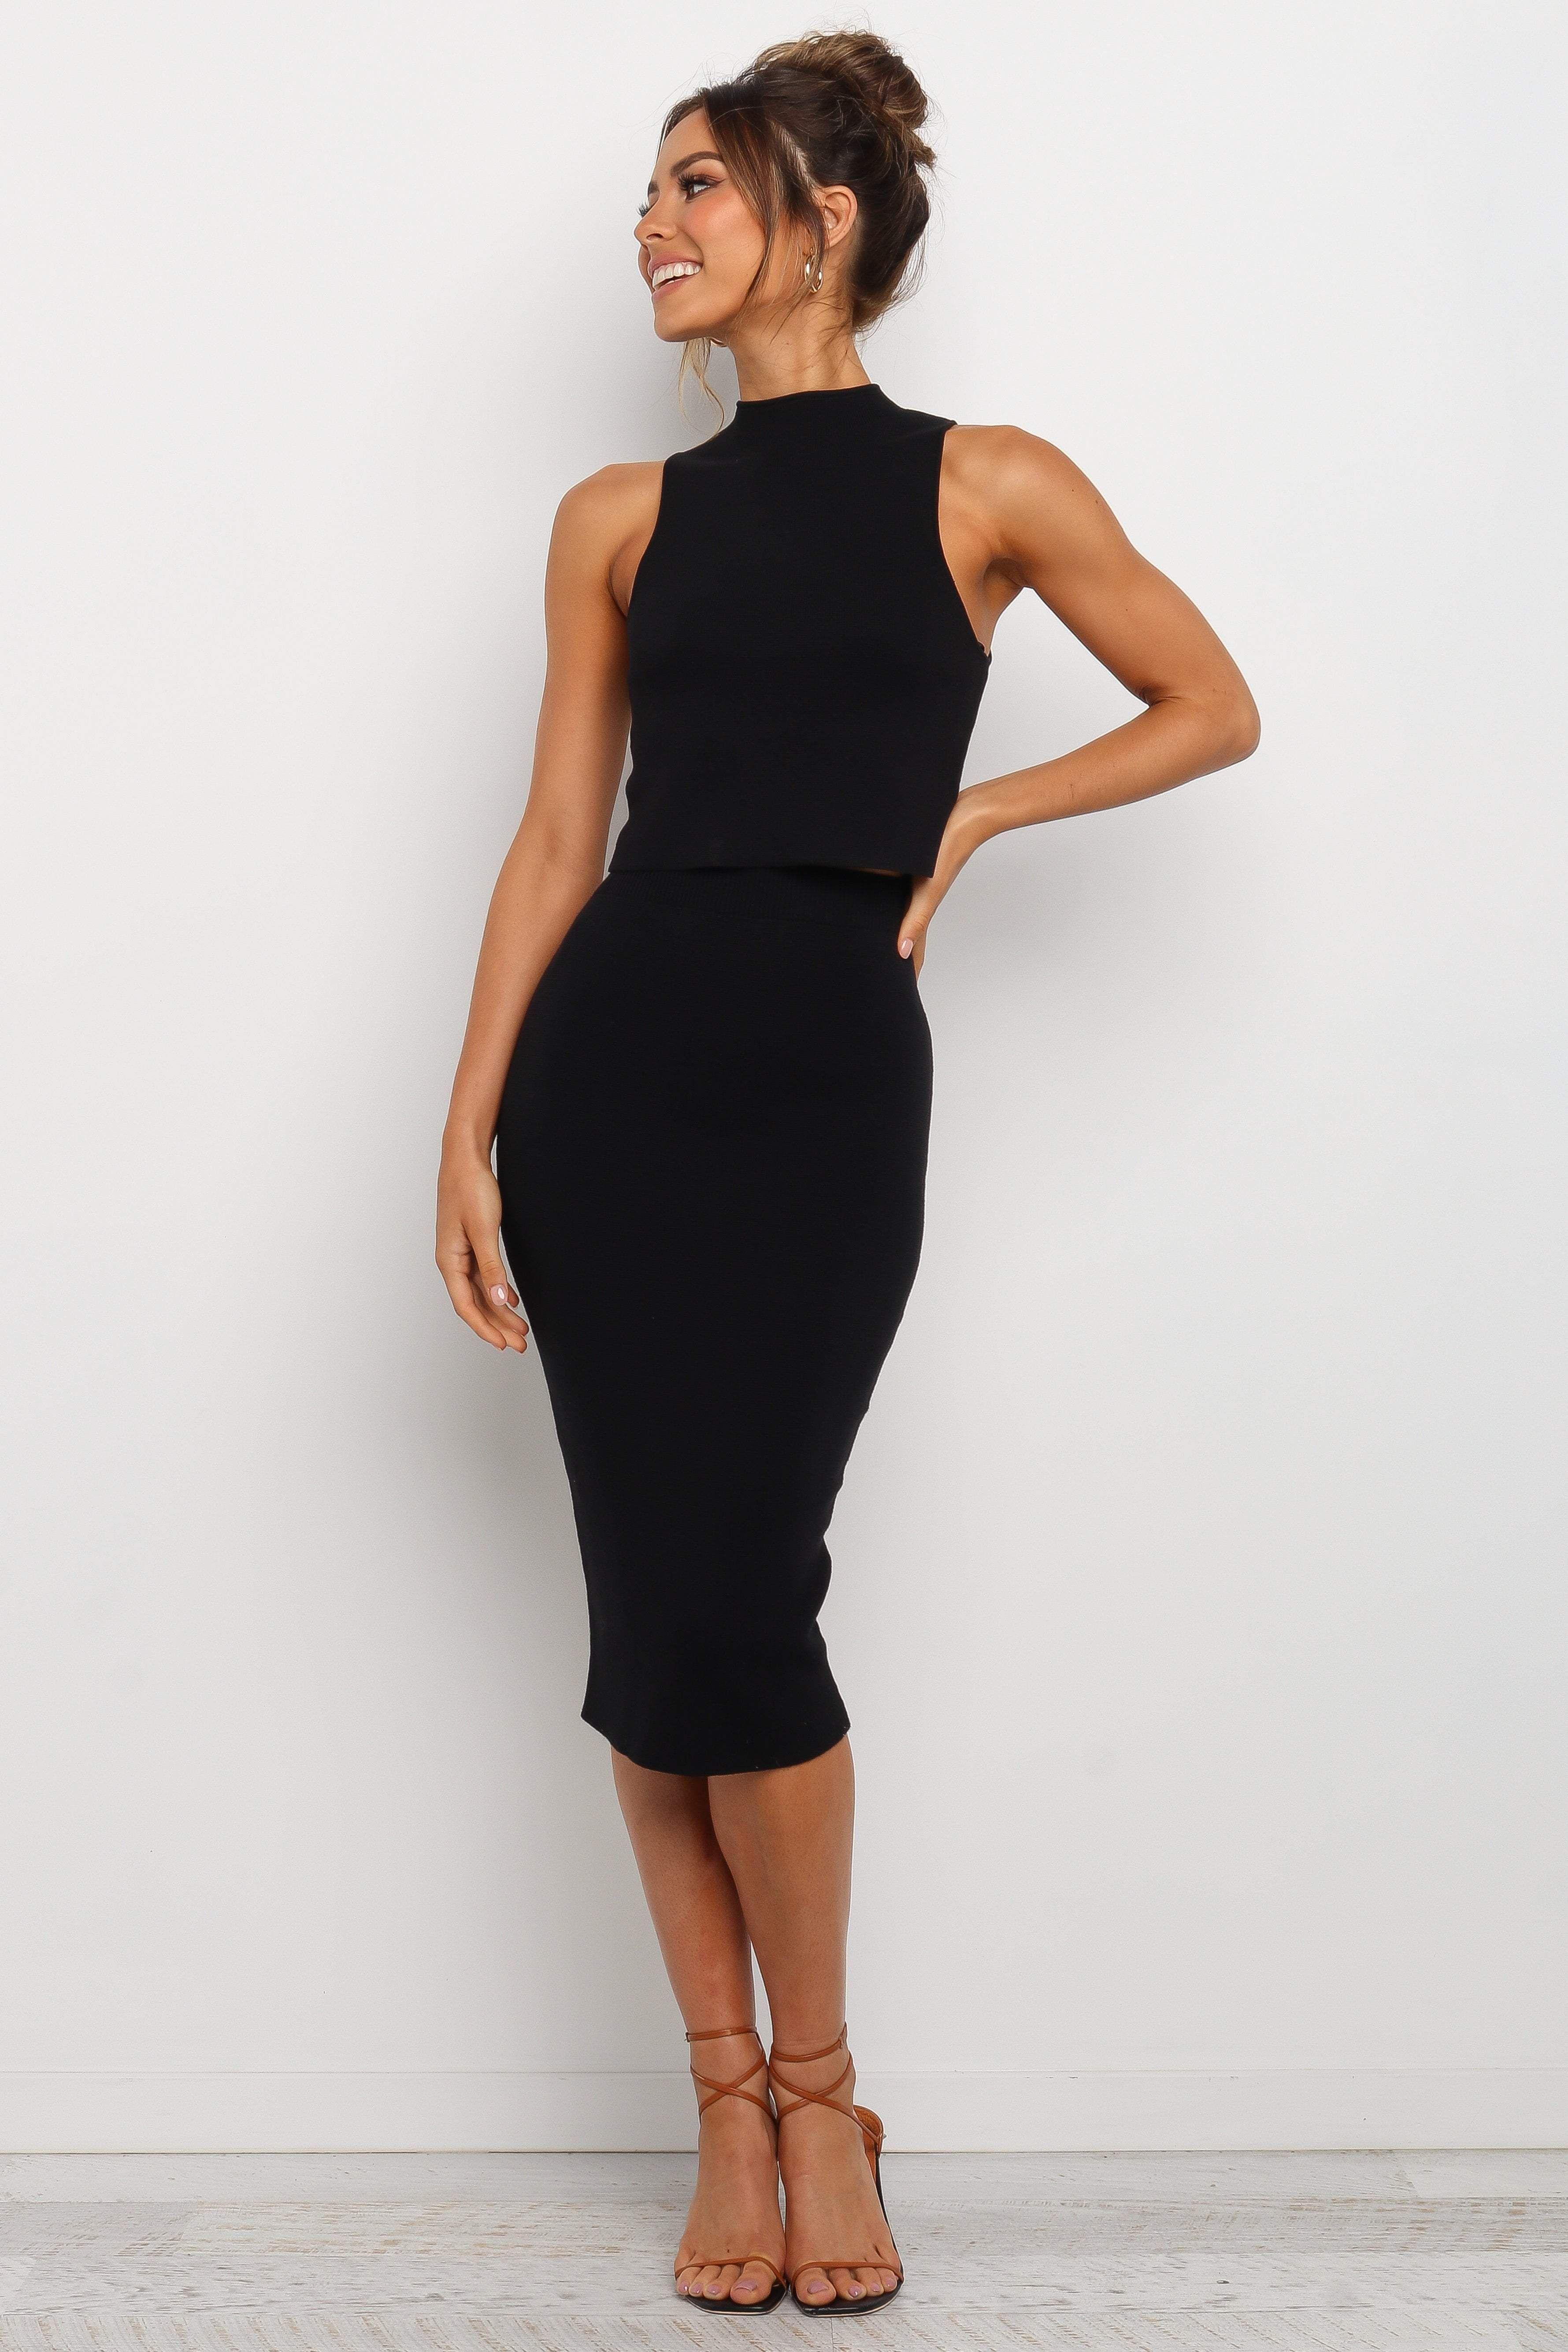 Zambia Top Black Little Black Dress Classy Black Dresses Classy Body Con Dress Outfit [ 5338 x 3559 Pixel ]